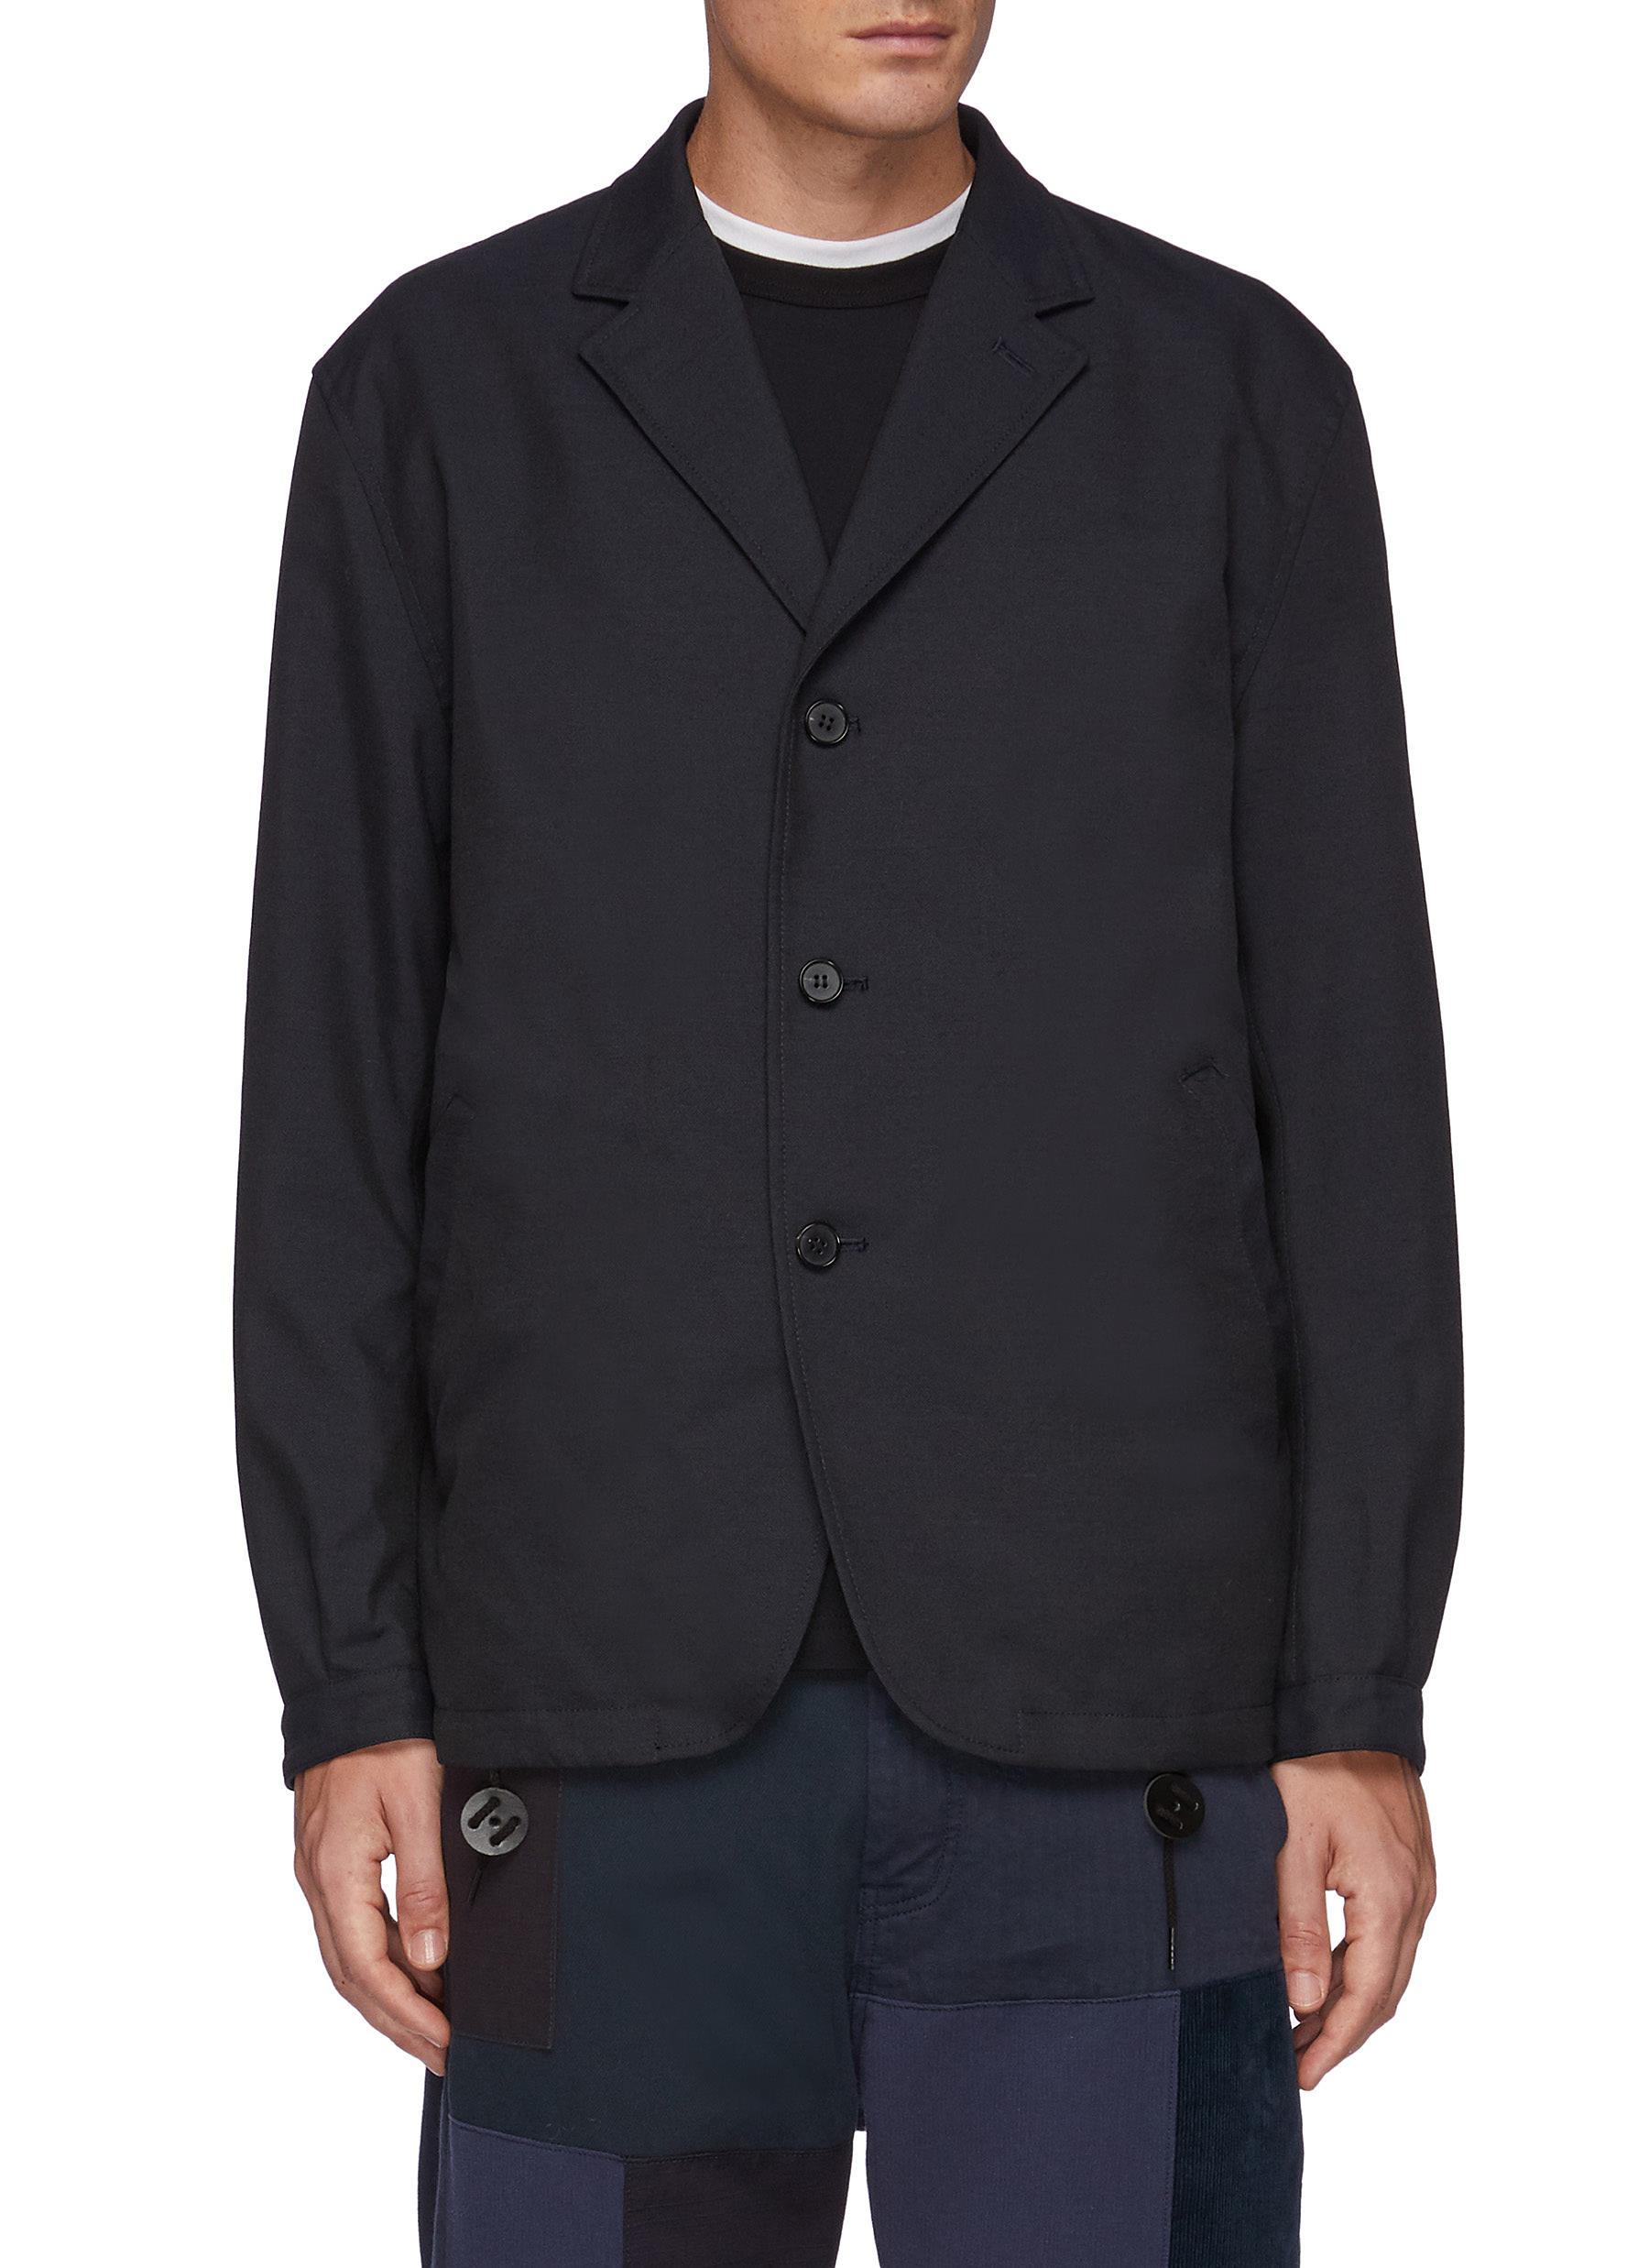 Reversible Colourblocking Flap Pocket Single Breasted Blazer